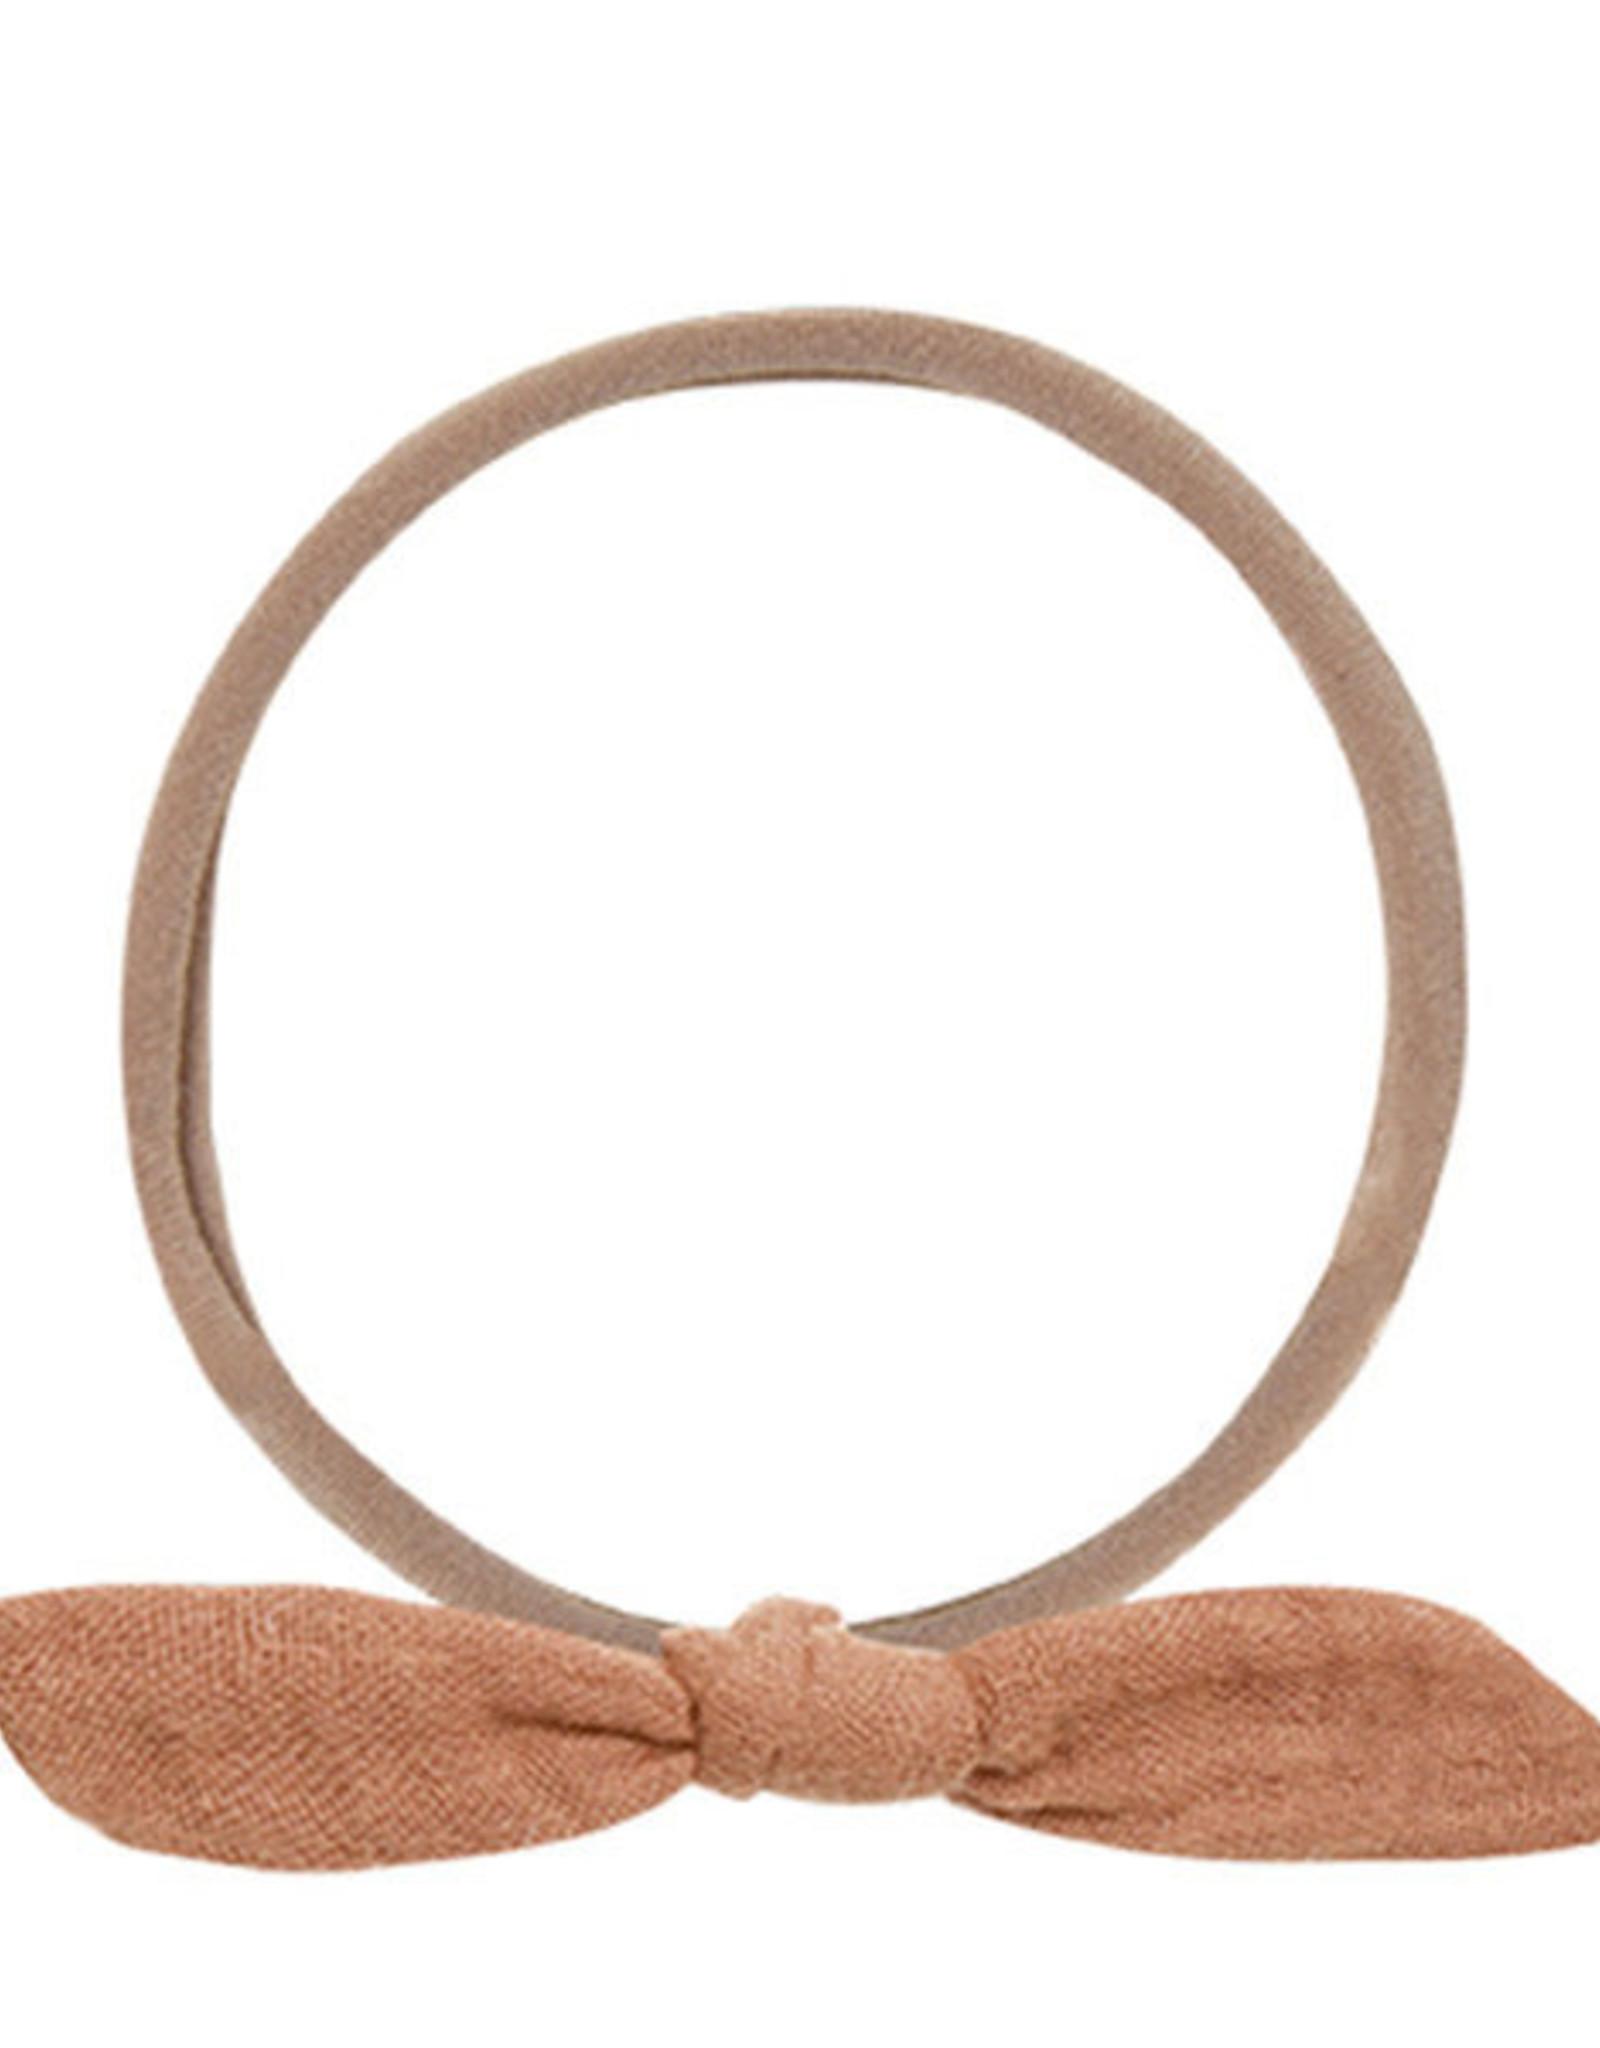 Rylee & Cru Rylee & Cru Knotted Headband